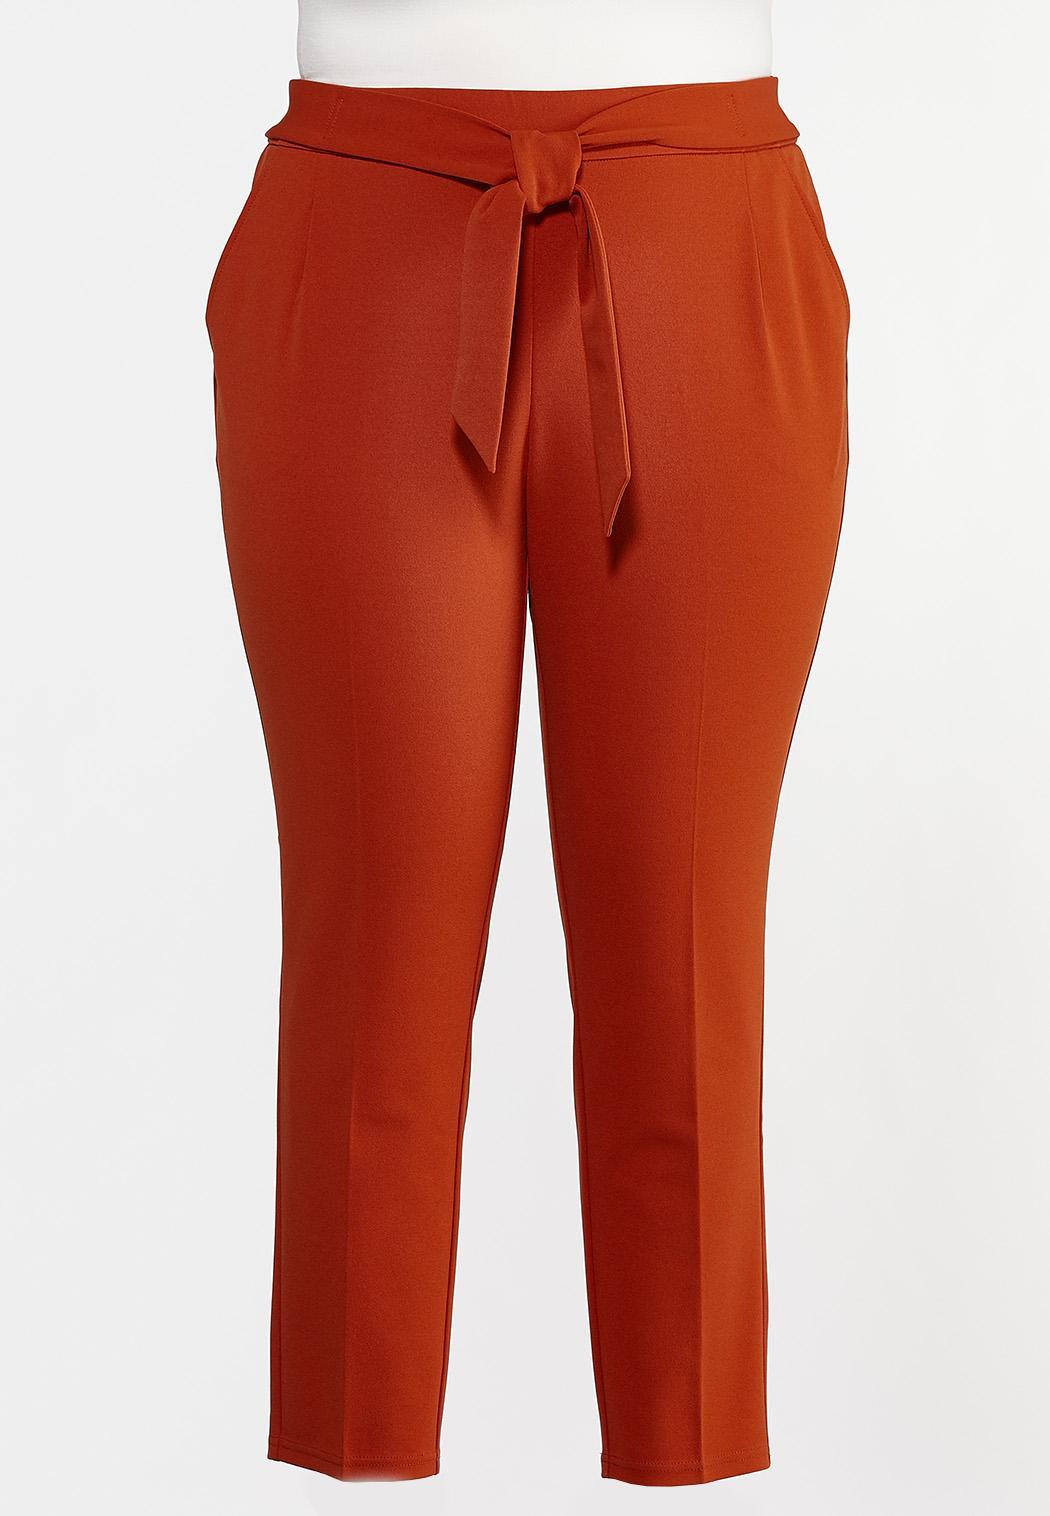 Plus Petite Slim Tie Waist Pants